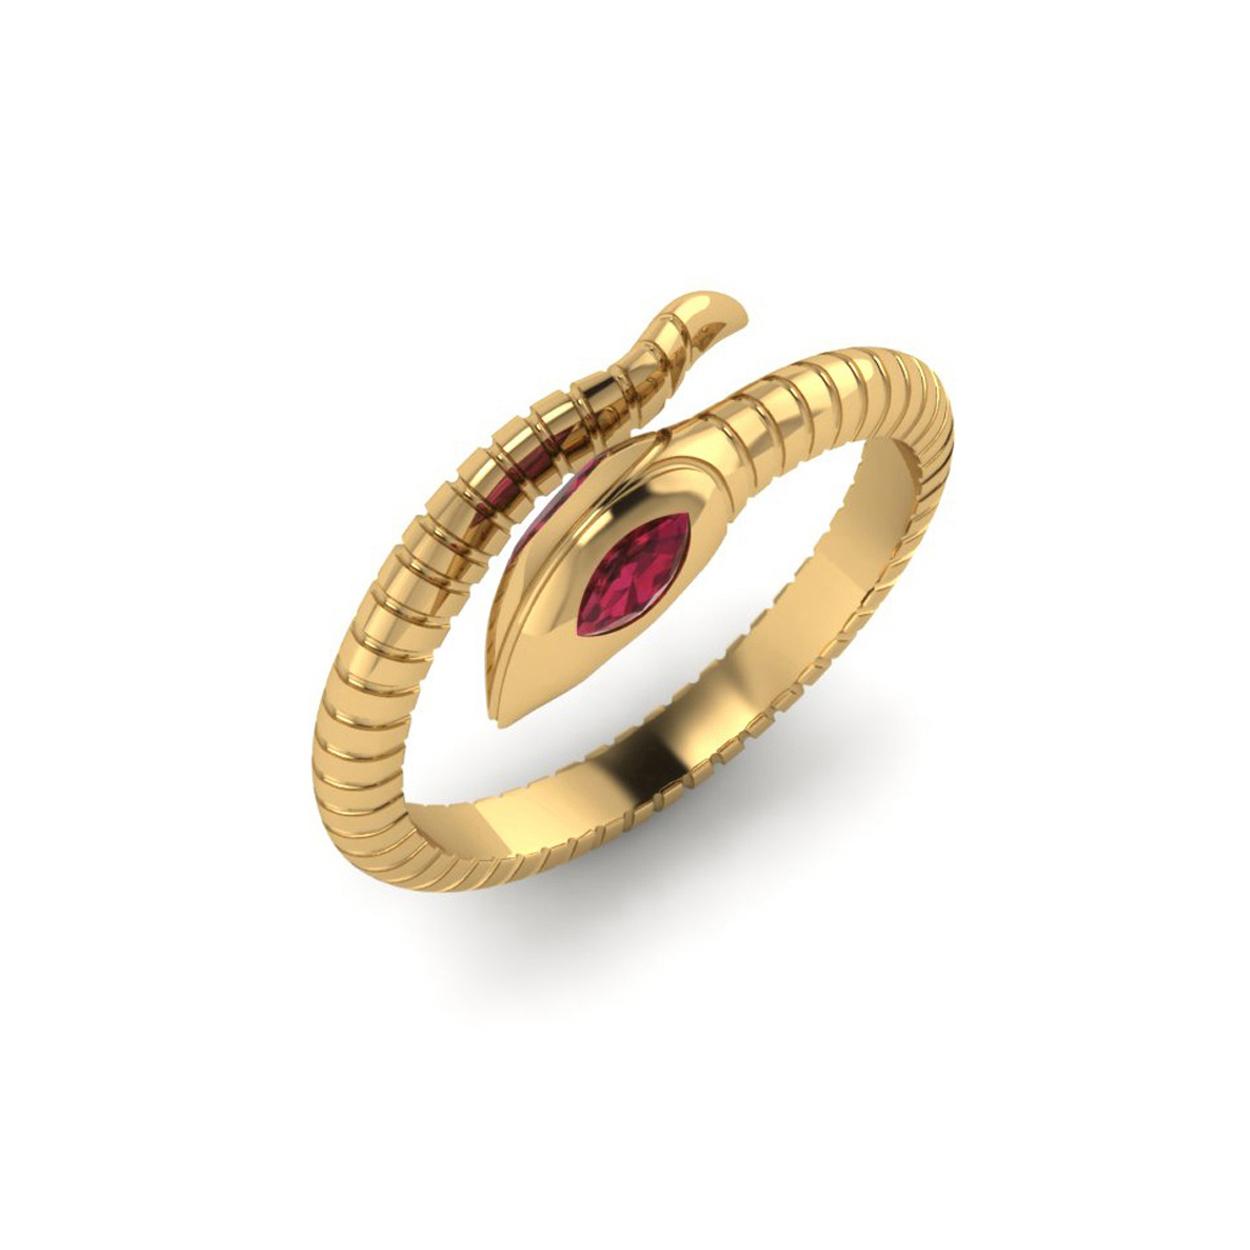 Bravo Clavello Jewelry